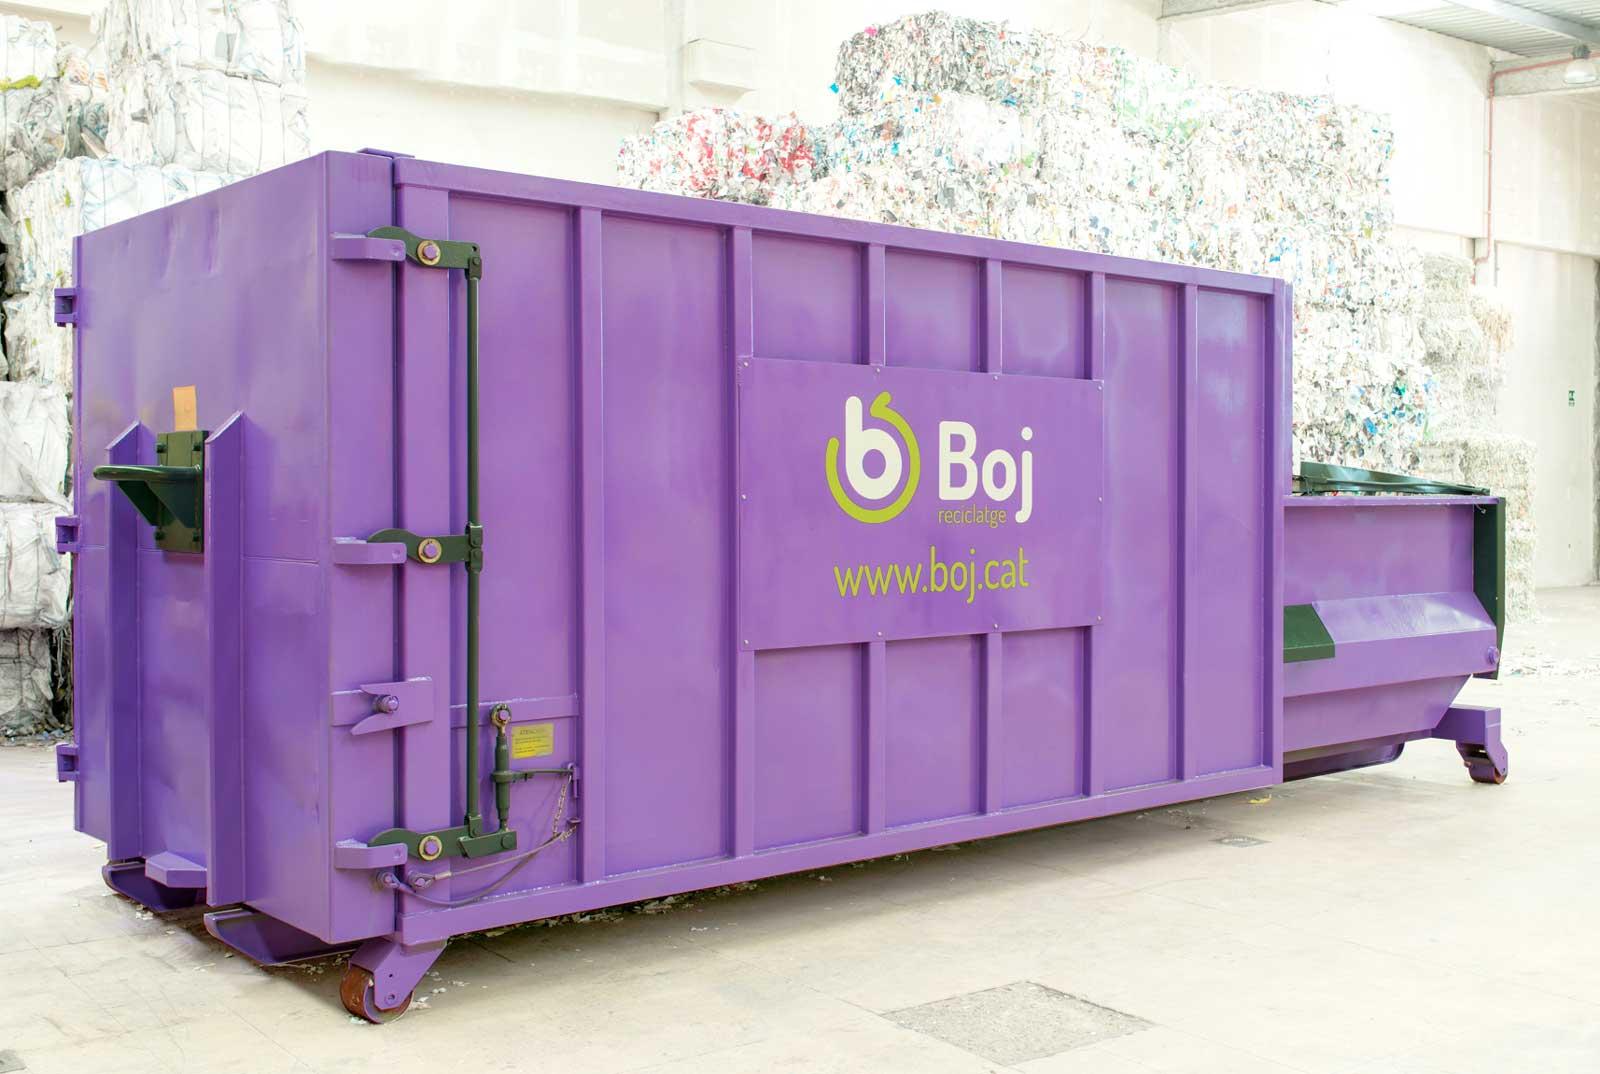 Contenidor autocompactador de Boj reciclatge - reciclaje